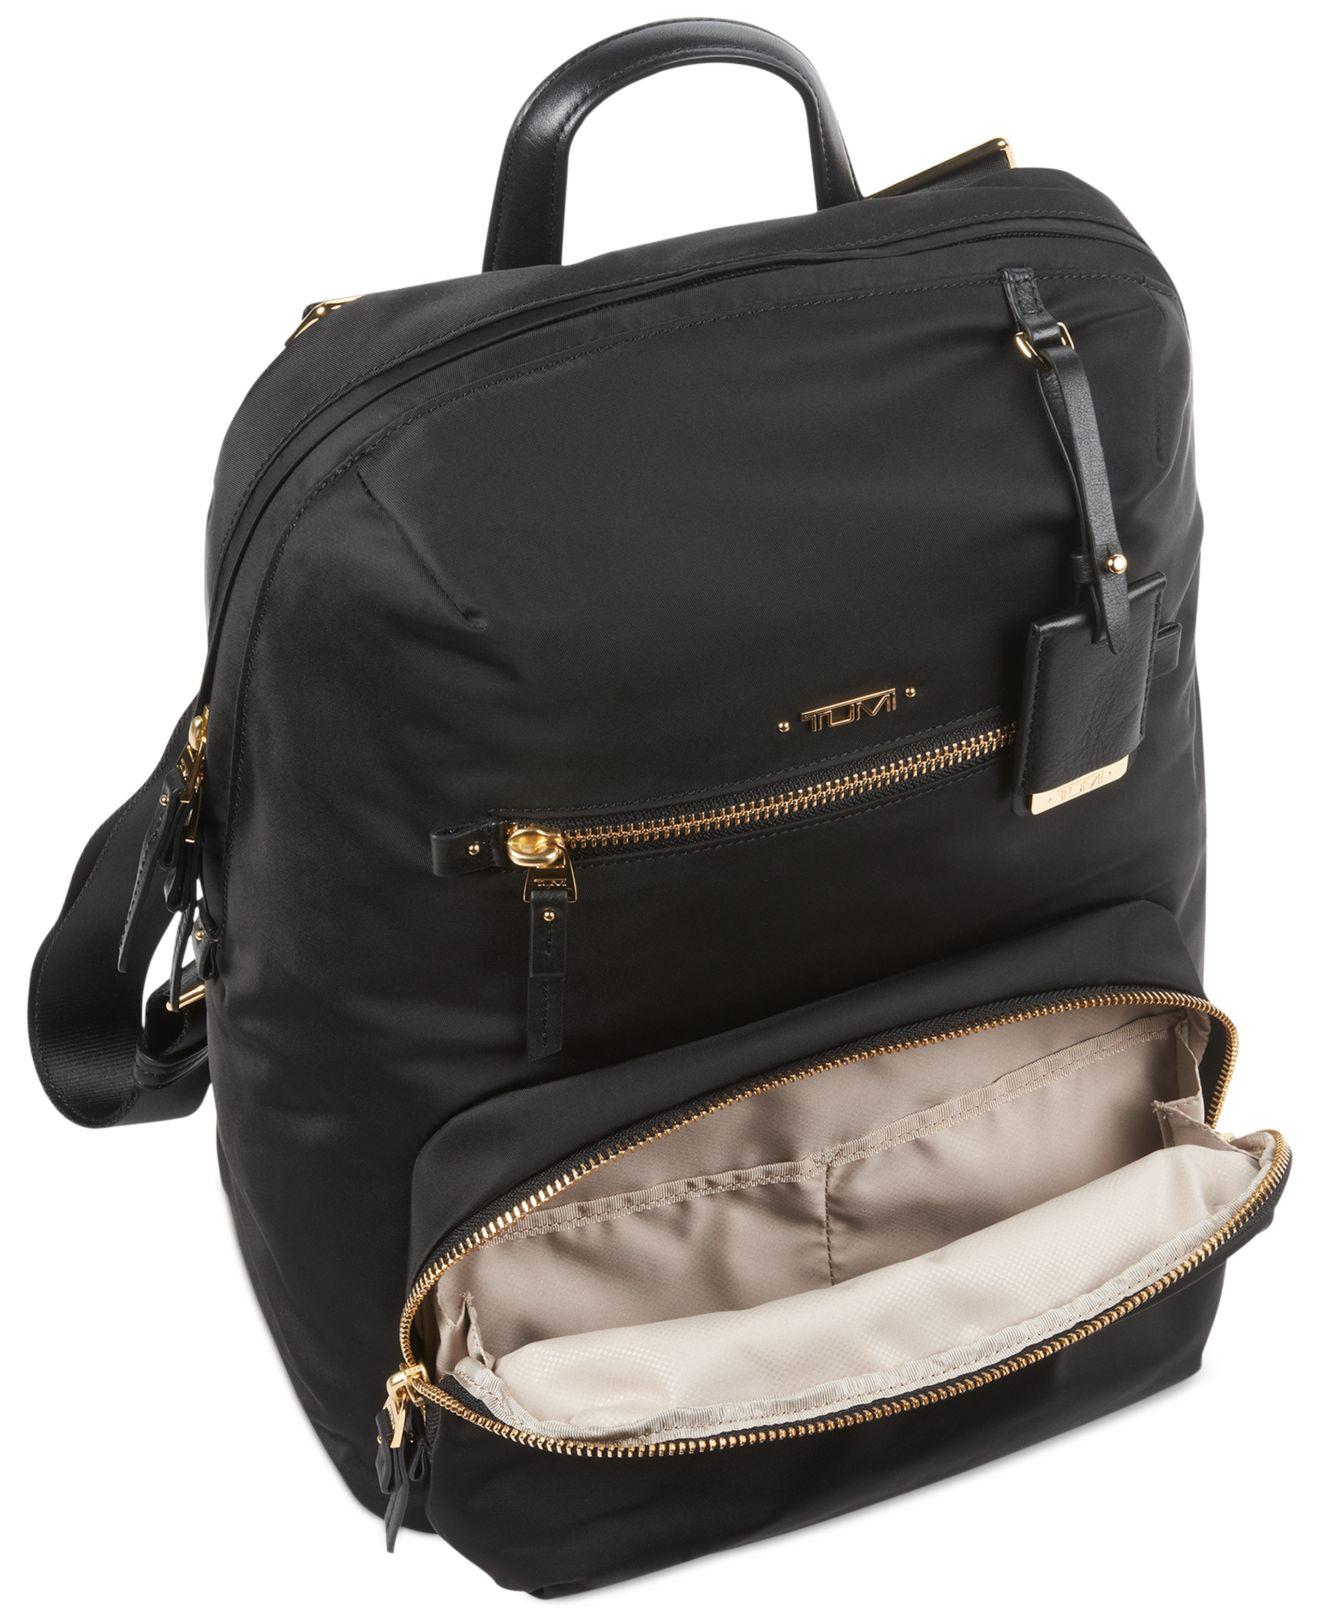 Tumi Voyageur Halle Backpack In Black Lyst